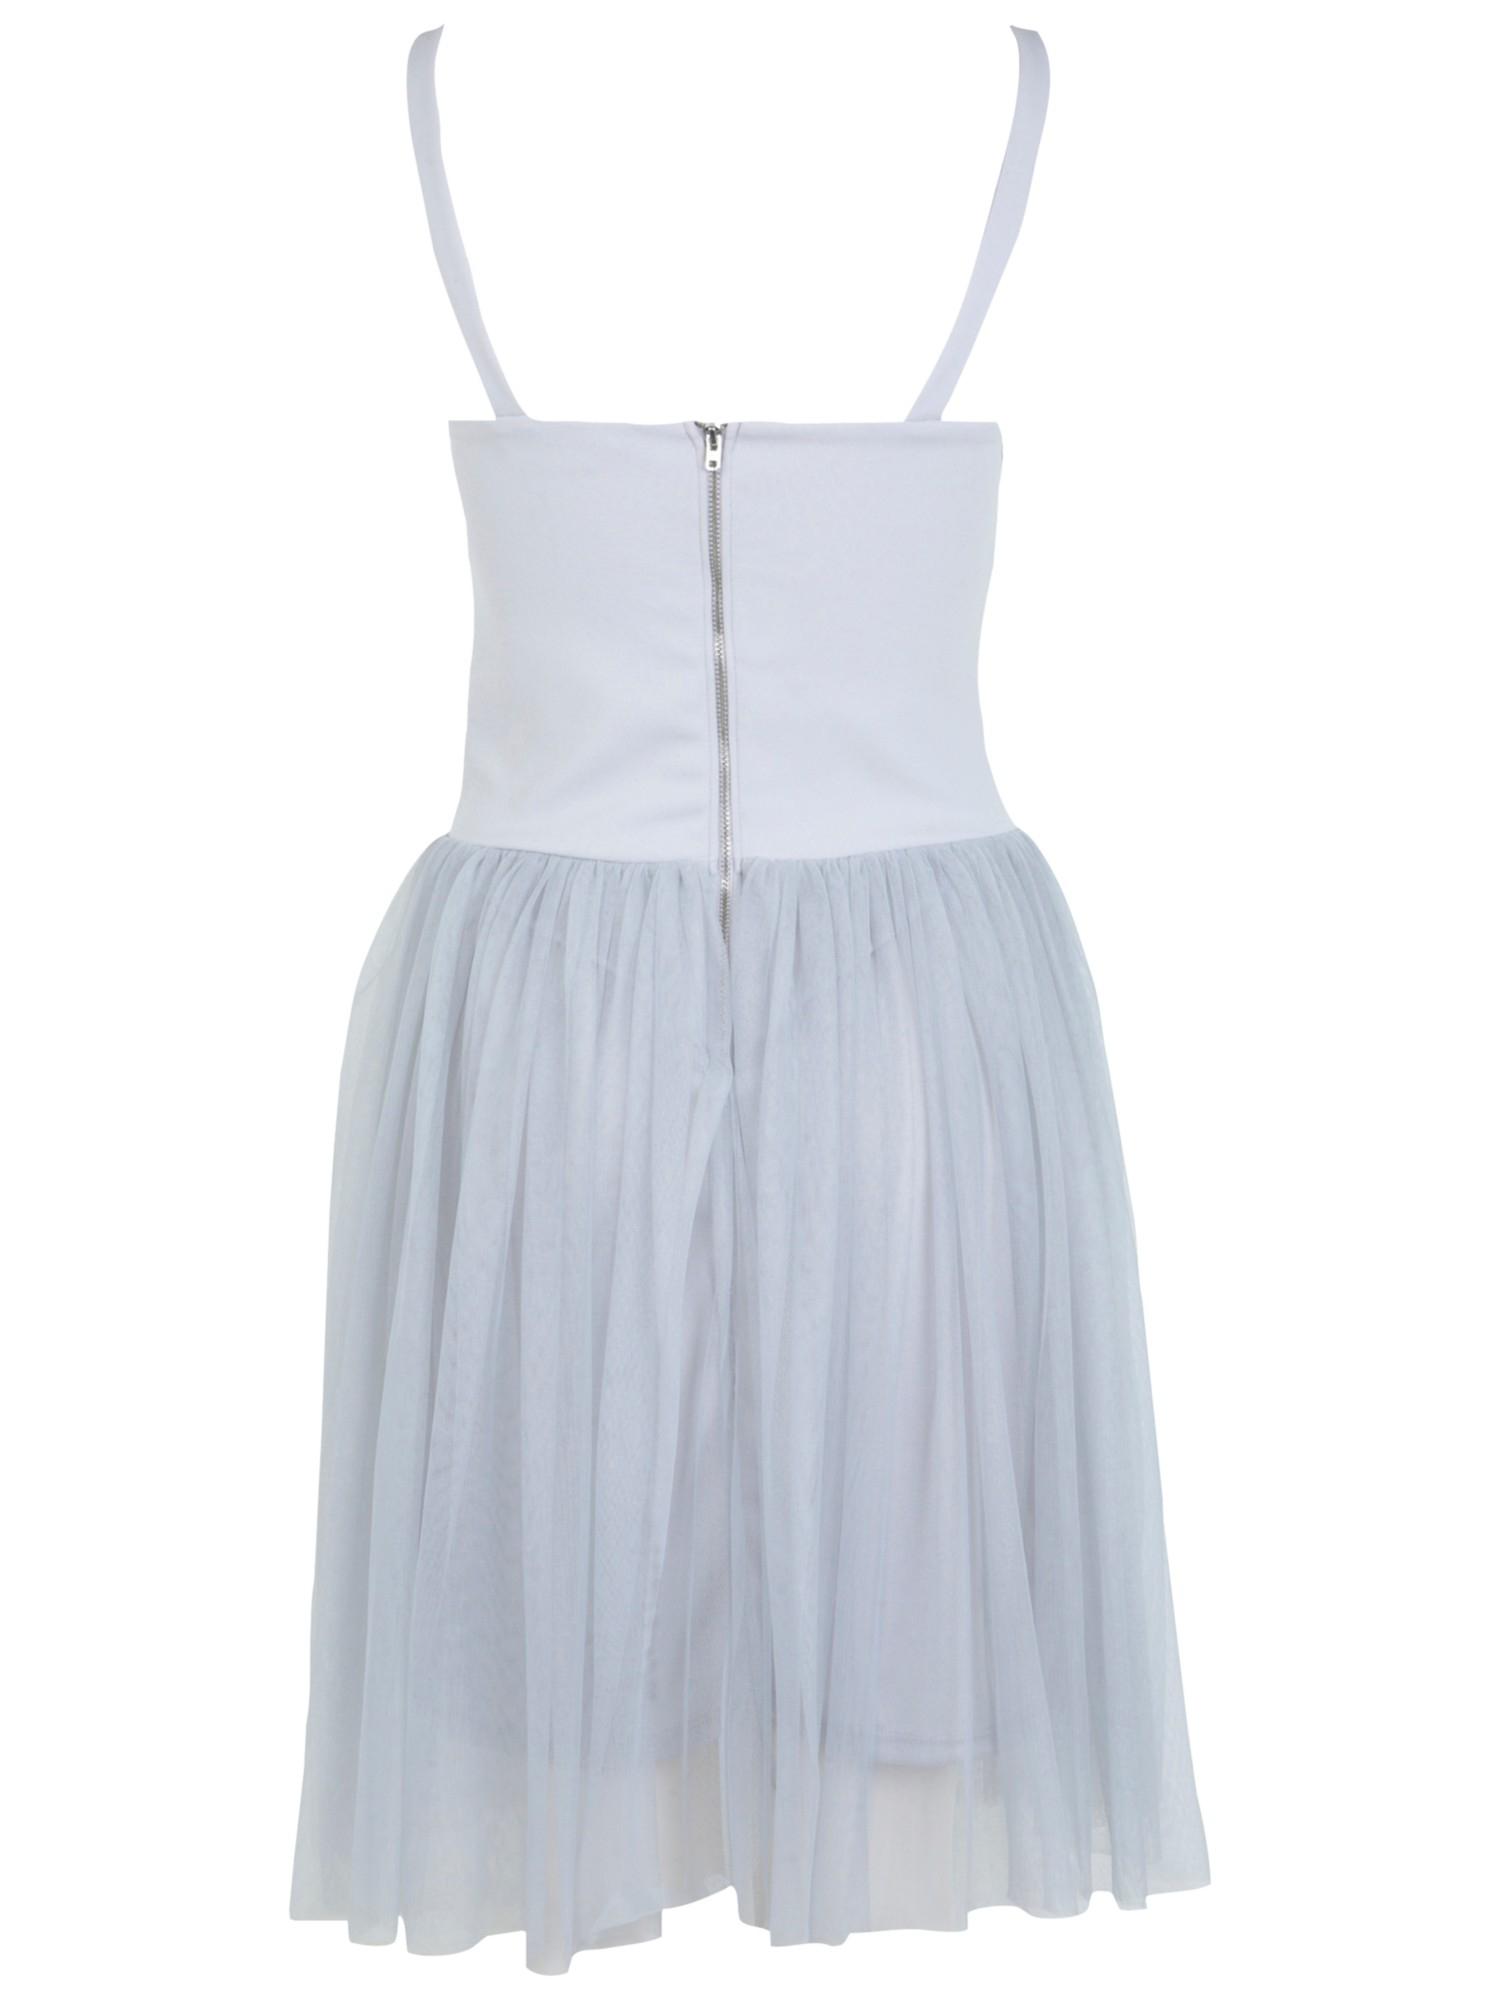 Miss Selfridge Embellished Body Tutu Dress in Blue - Lyst